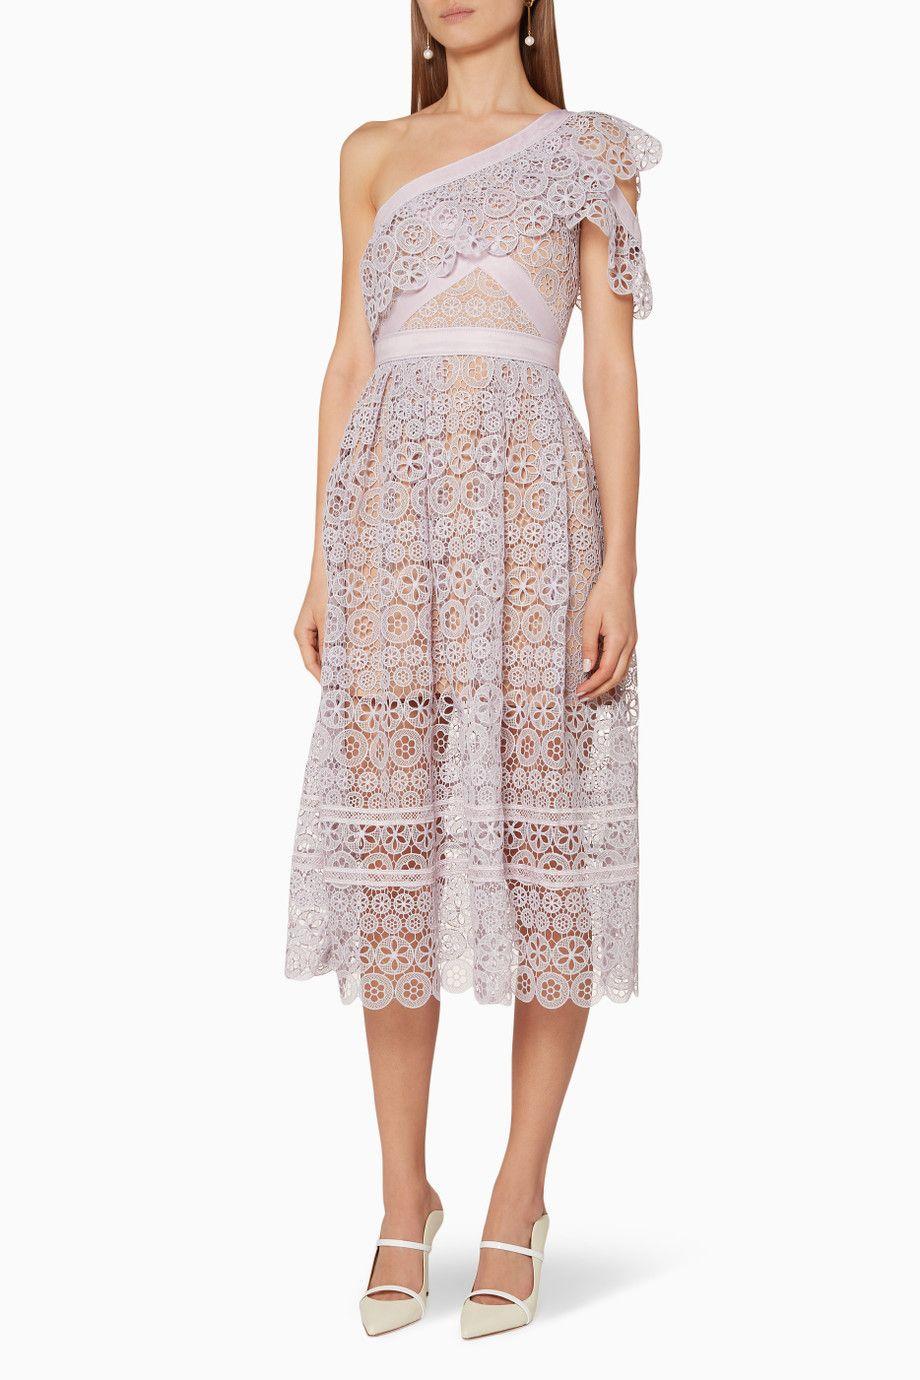 1cfb8ab27ac3 Shop Luxury Self-Portrait Lilac One Shoulder Floral Lace Dress | Ounass UAE